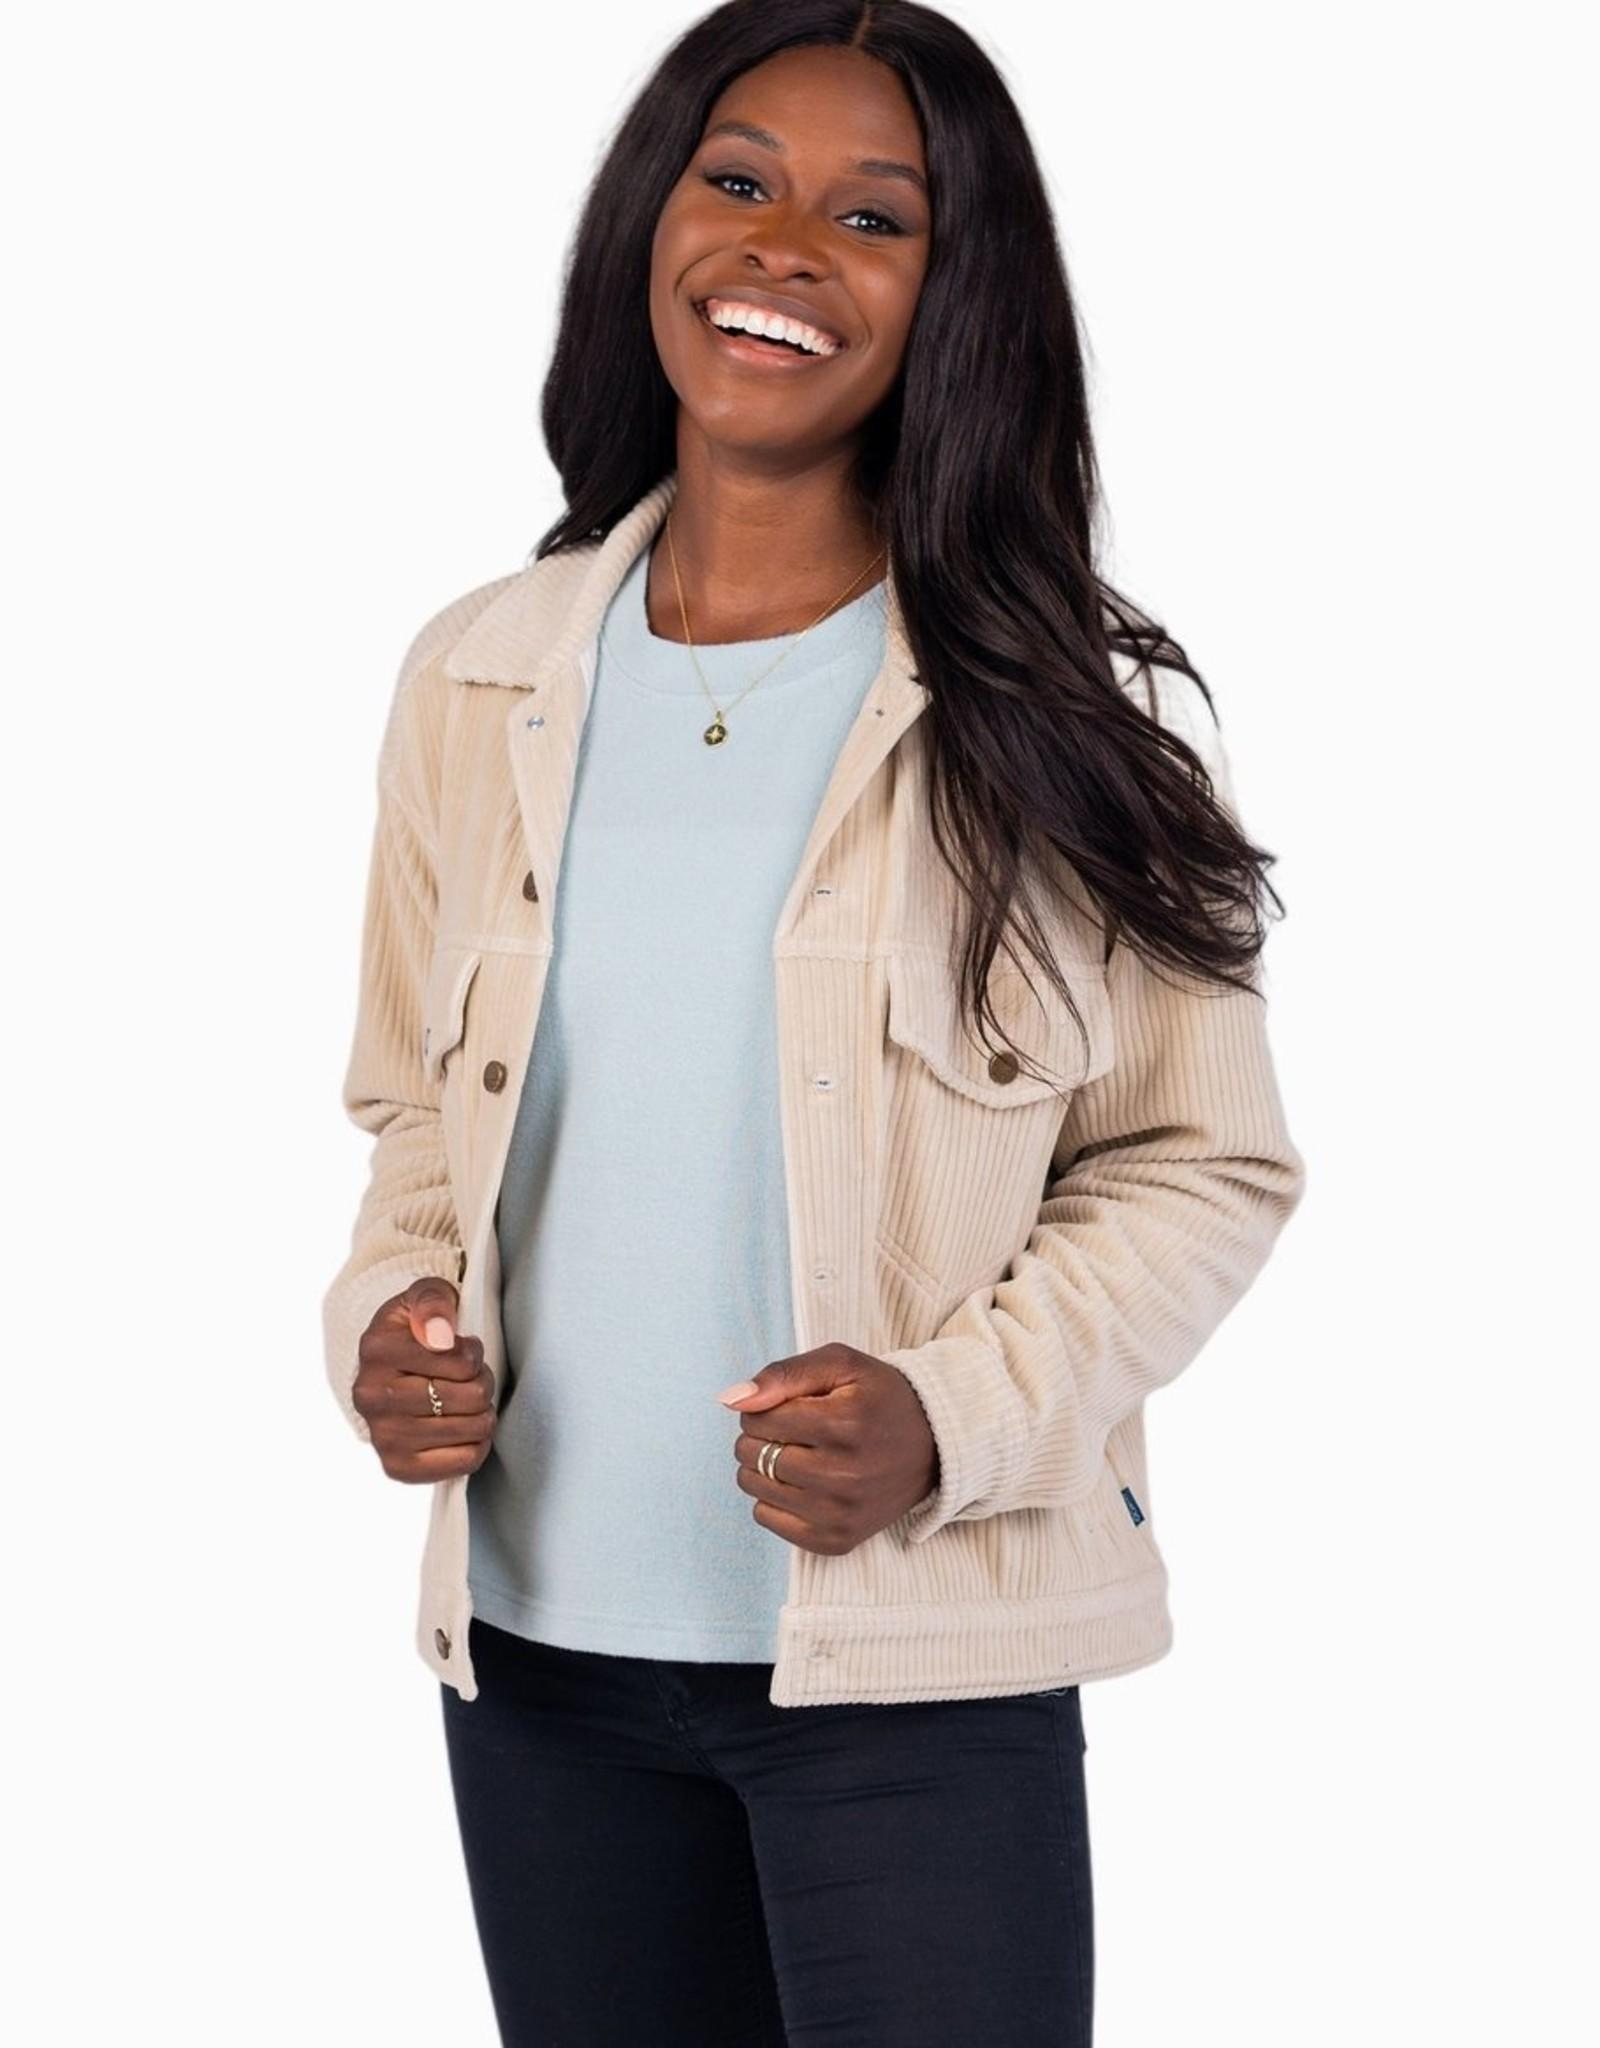 Southern Shirt Cordy Corduroy Jacket/2V014